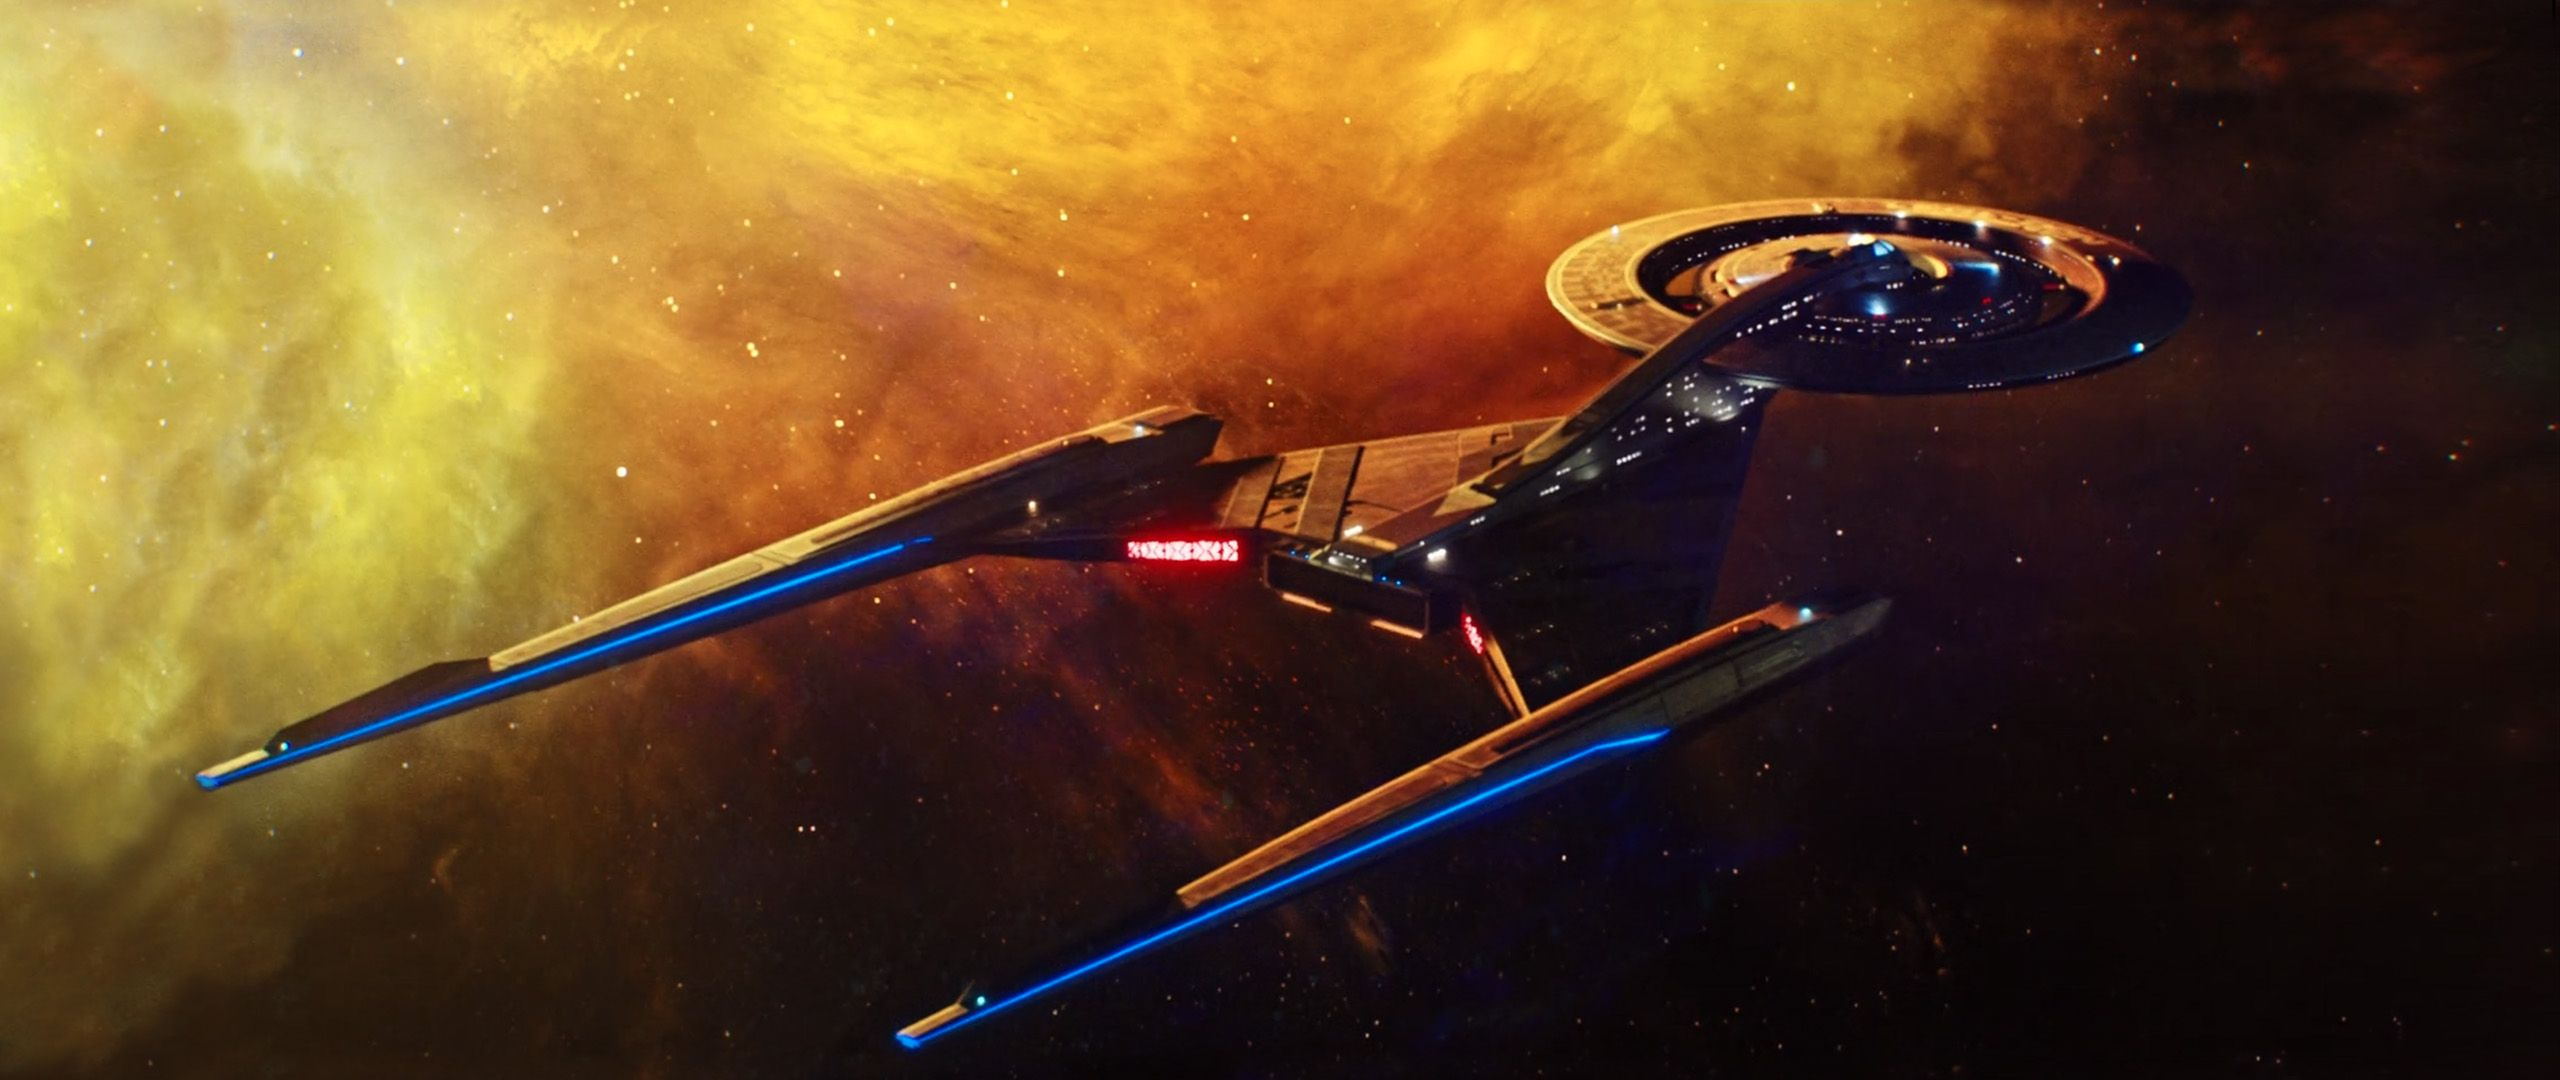 Star Trek Discovery Ist Das überhaupt Star Trek Teil 2 Star